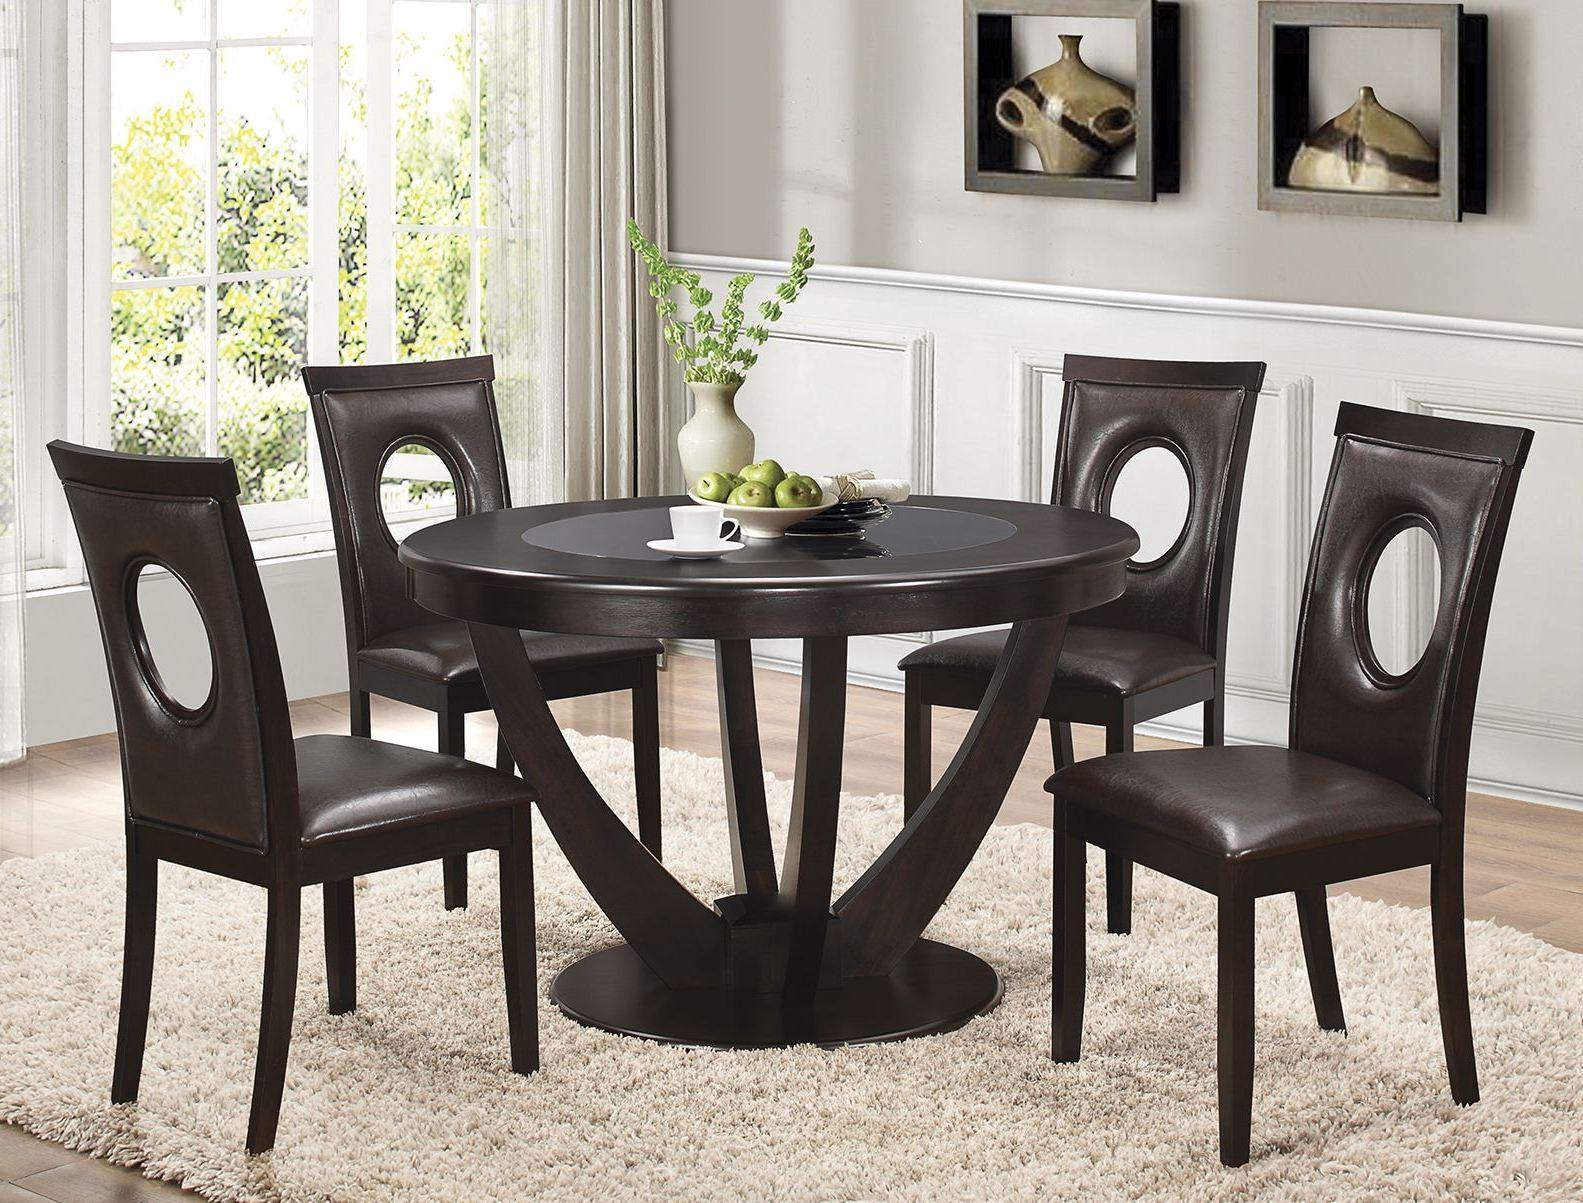 stapleton cappuccino round dining room set 106741 cappuccino counter height dining room set 100319 coaster